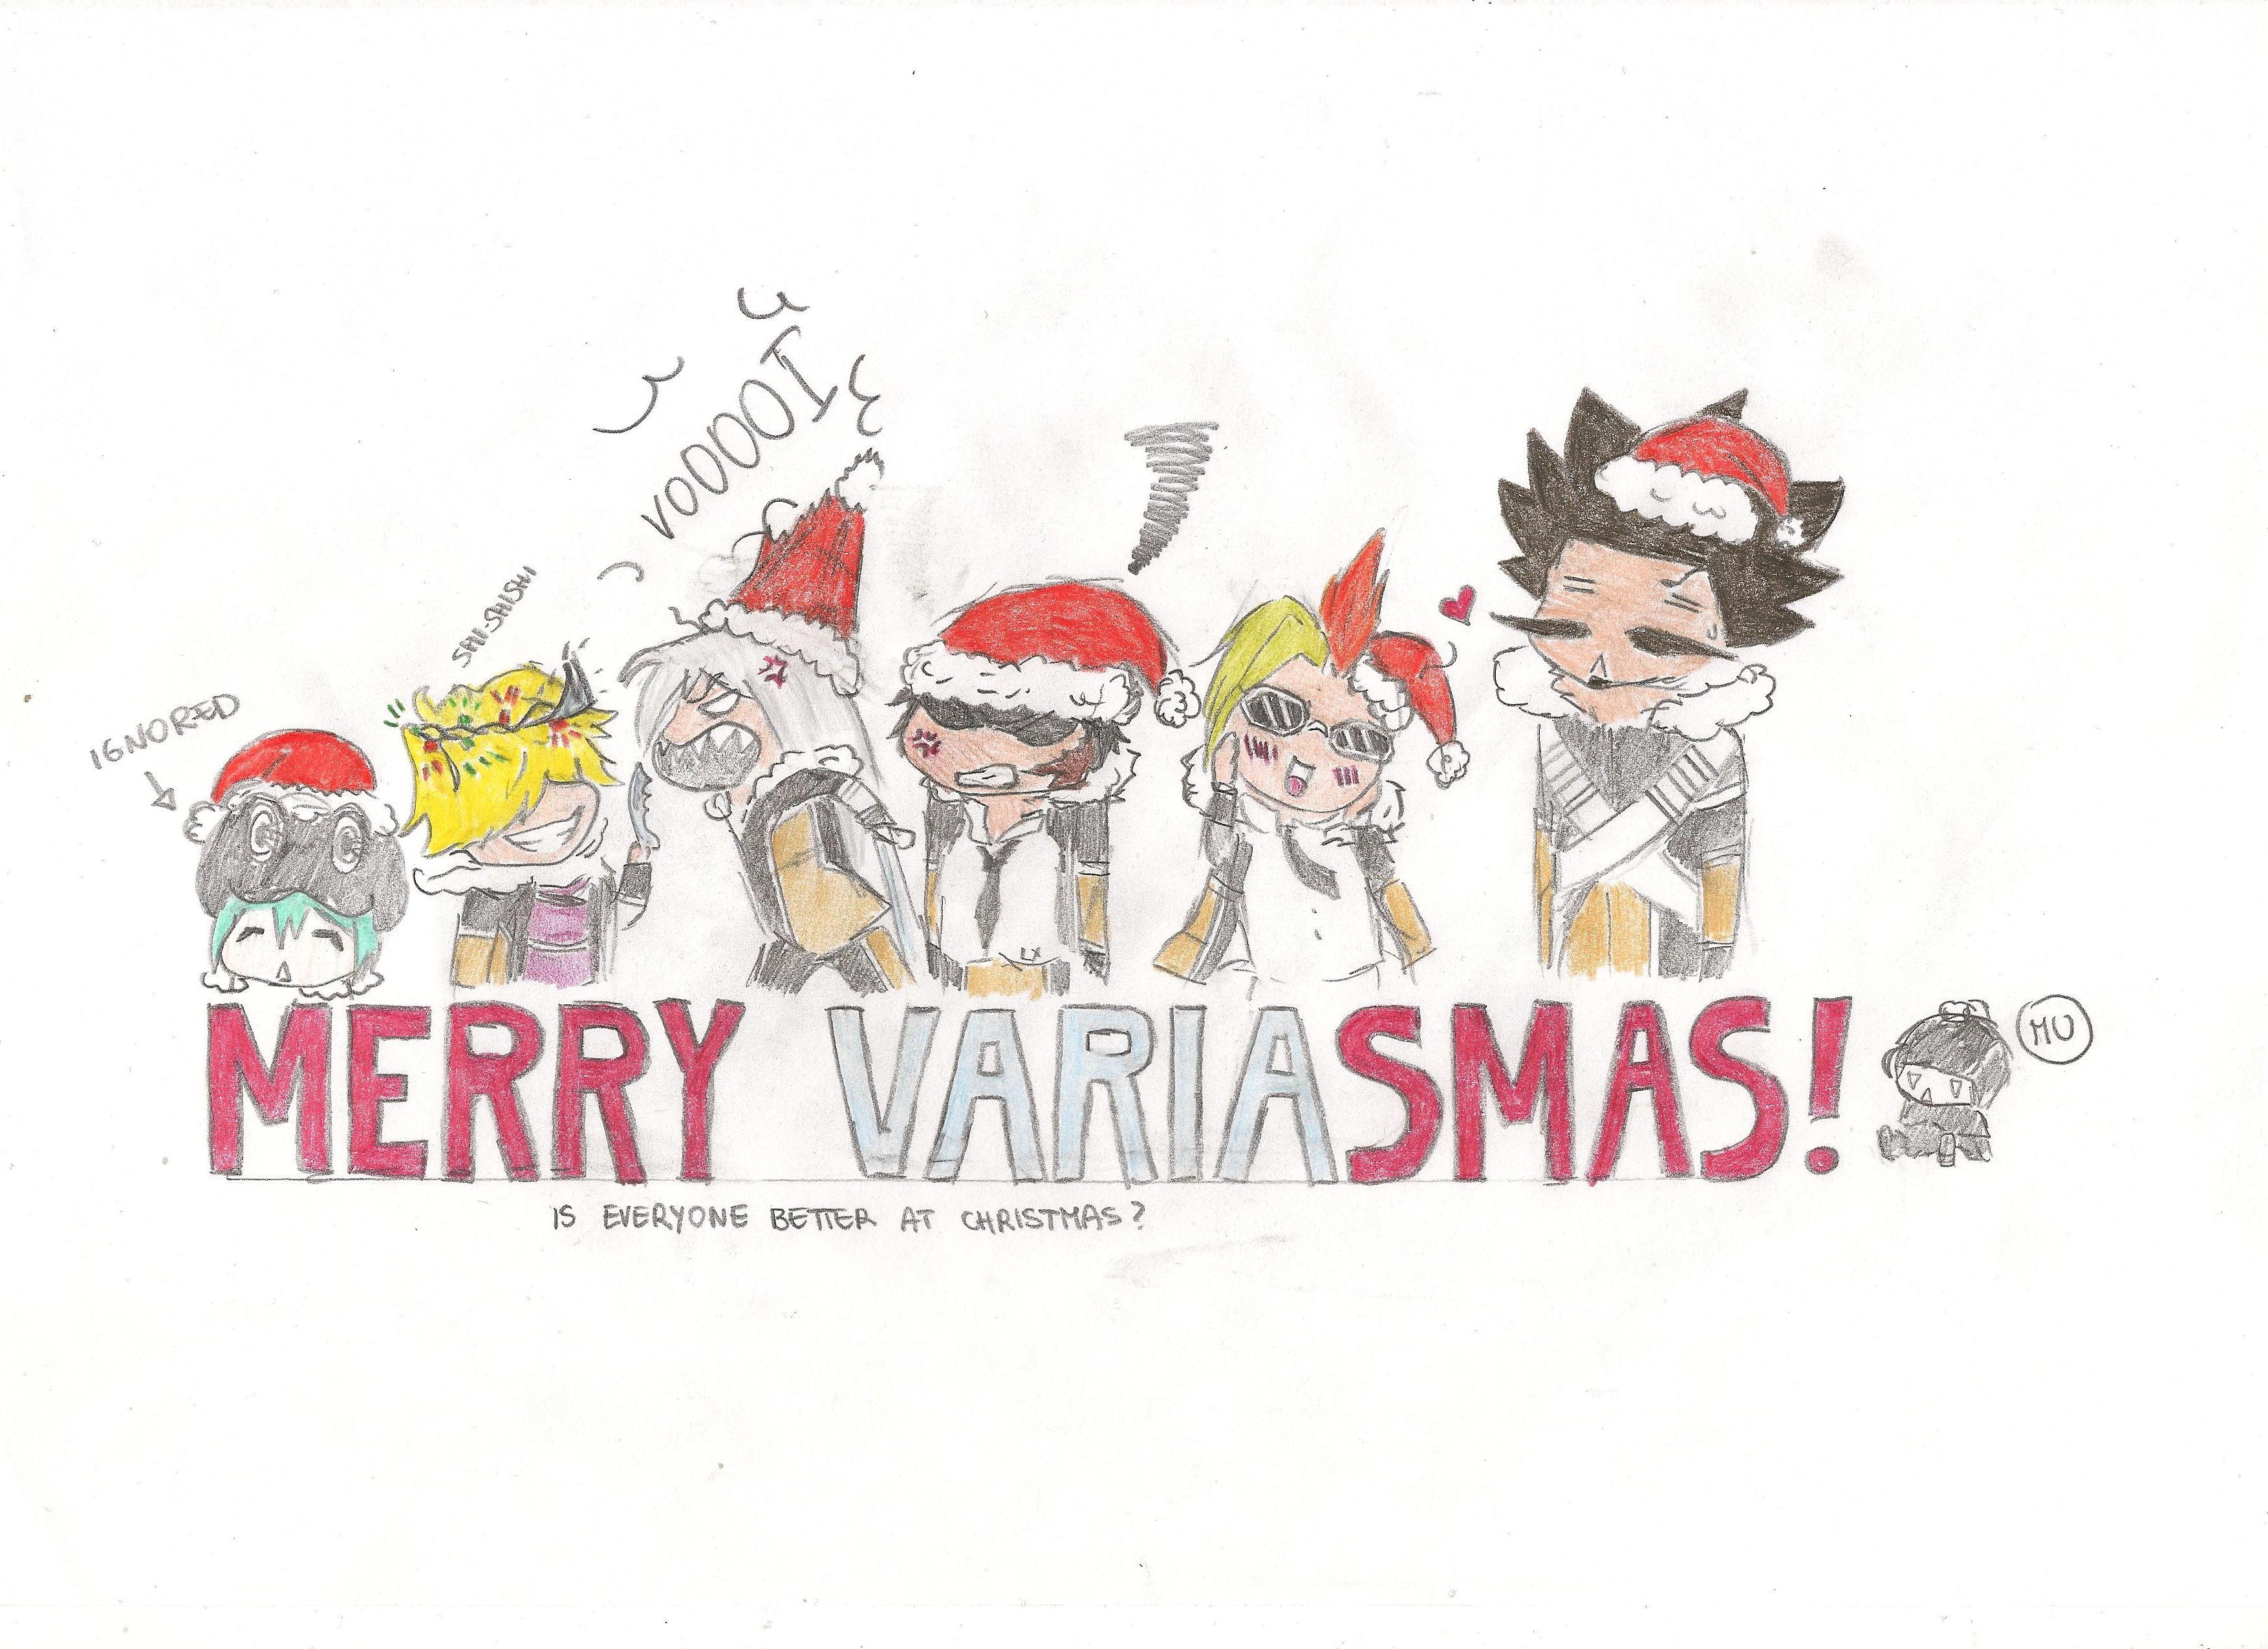 Merry Variasmas by Larcheex-Clicexia